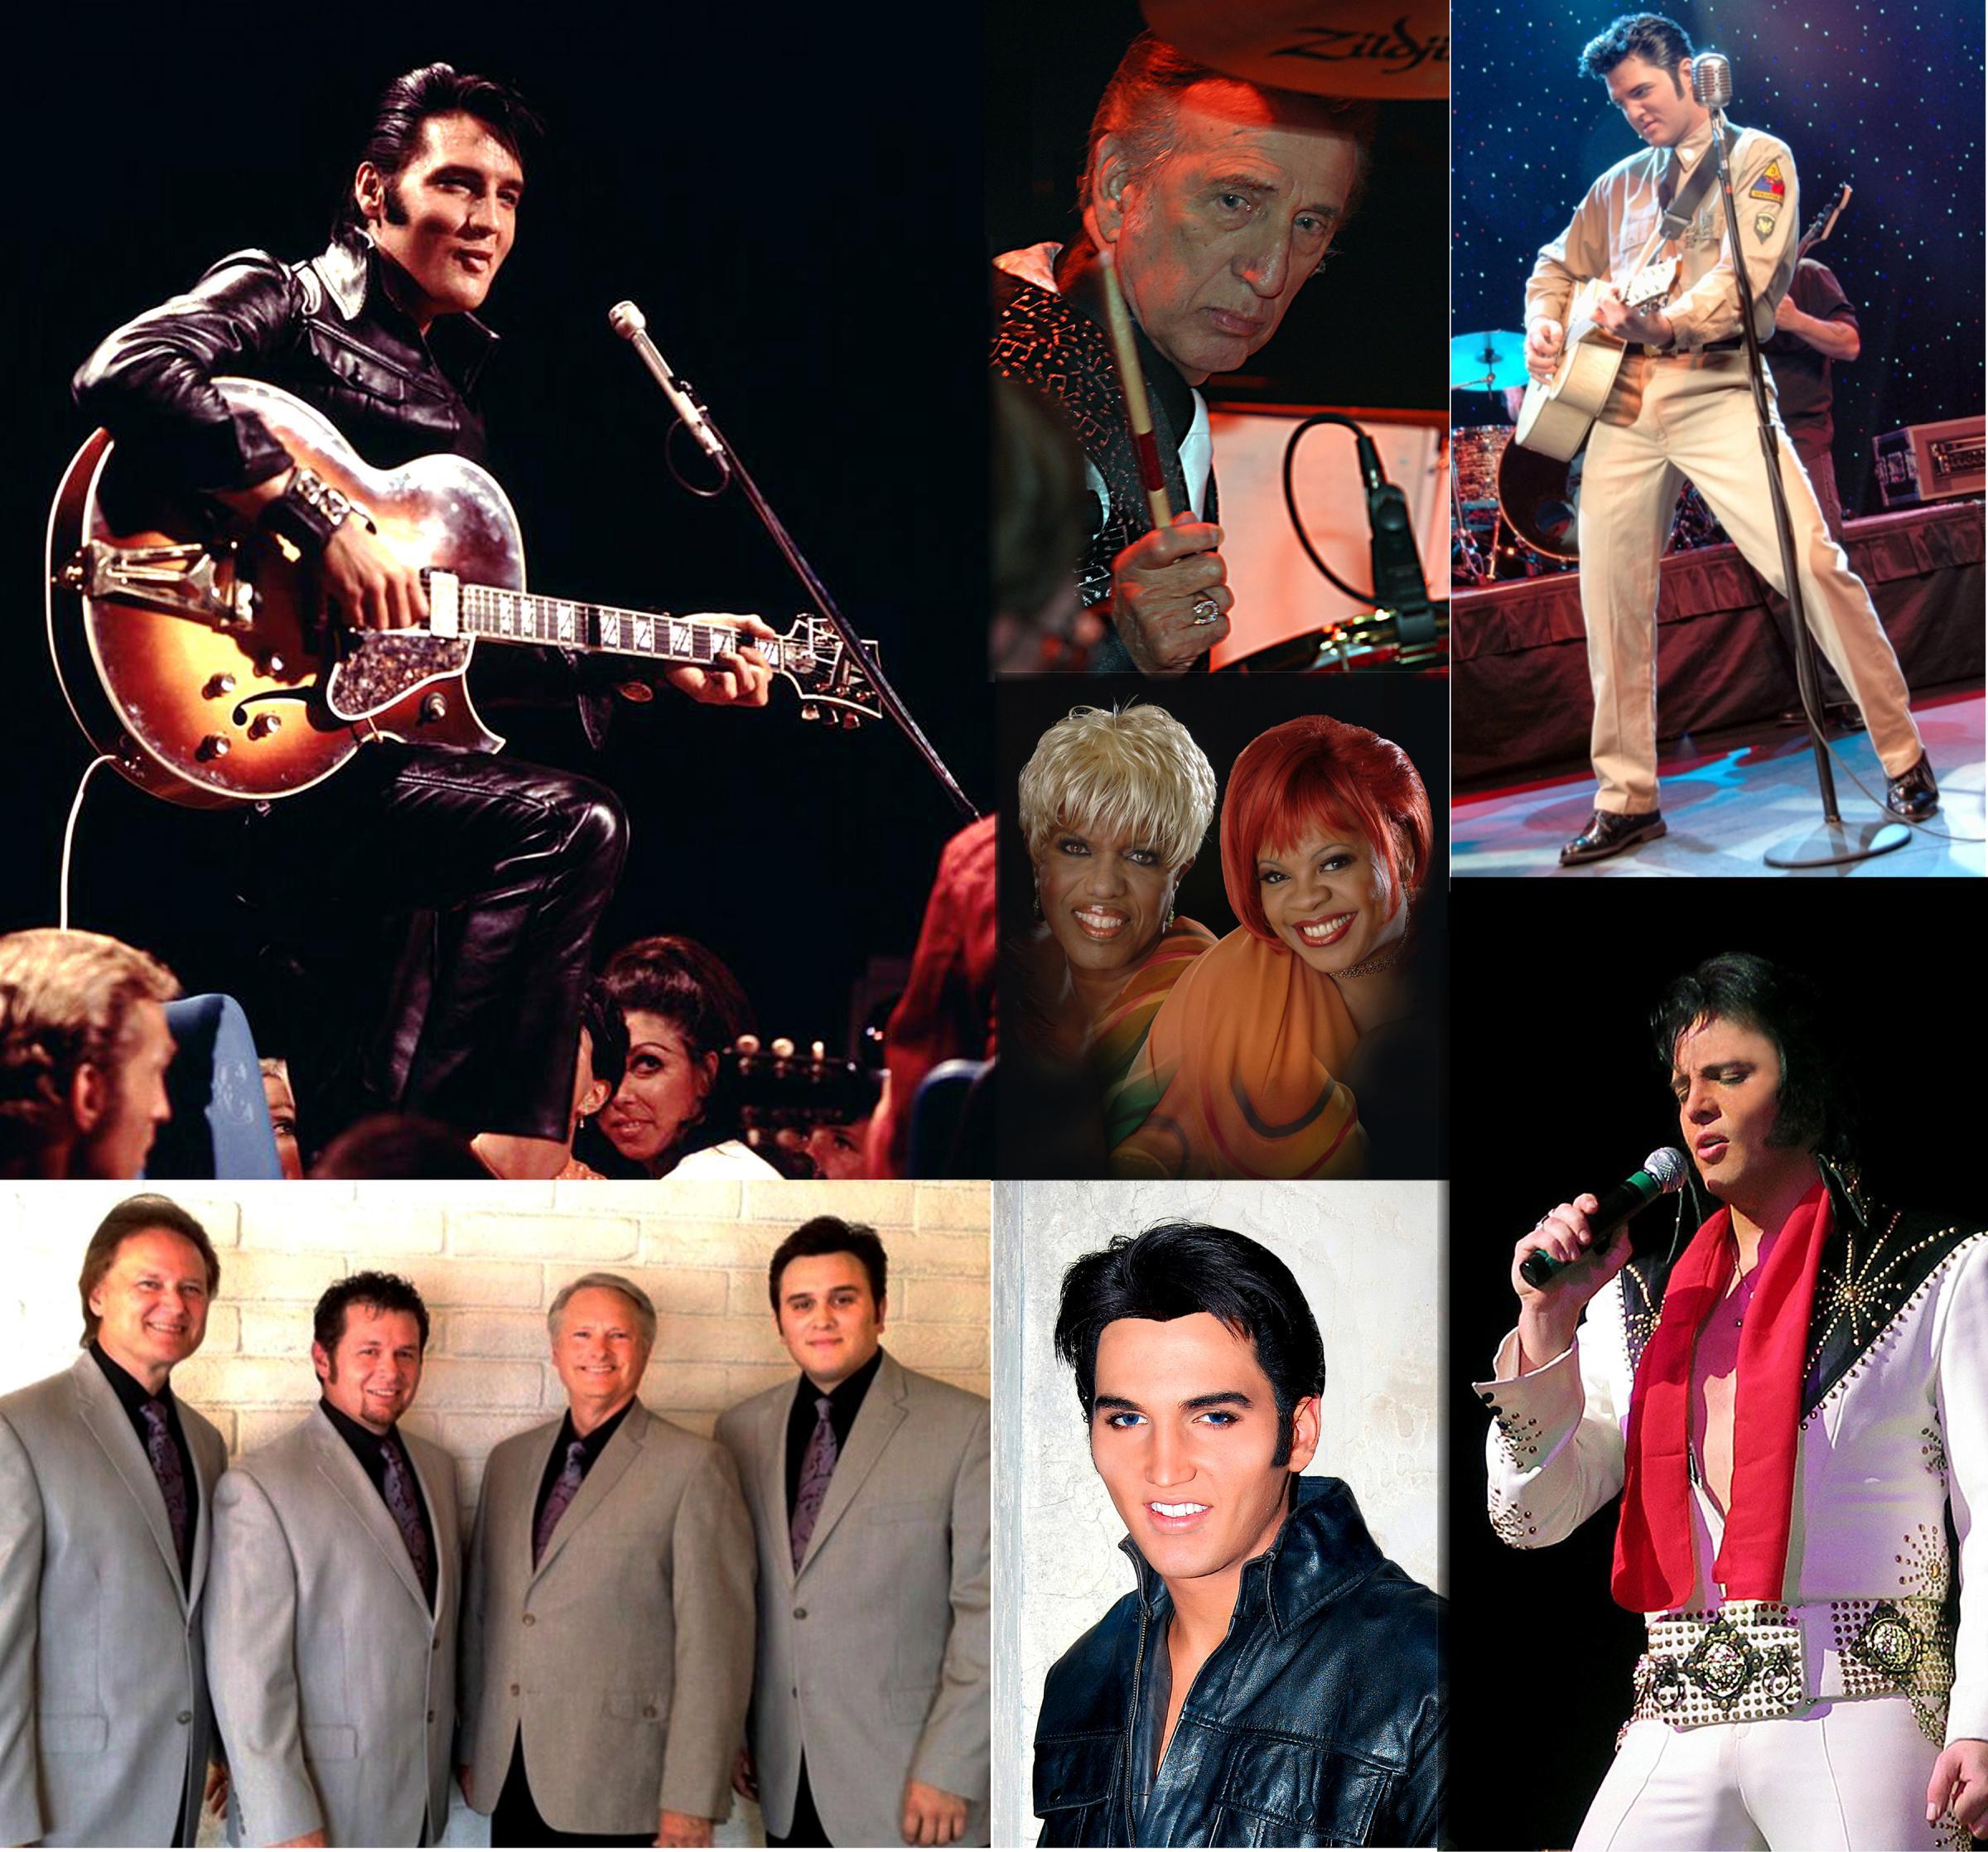 Elvis Presleys Last Day Alive